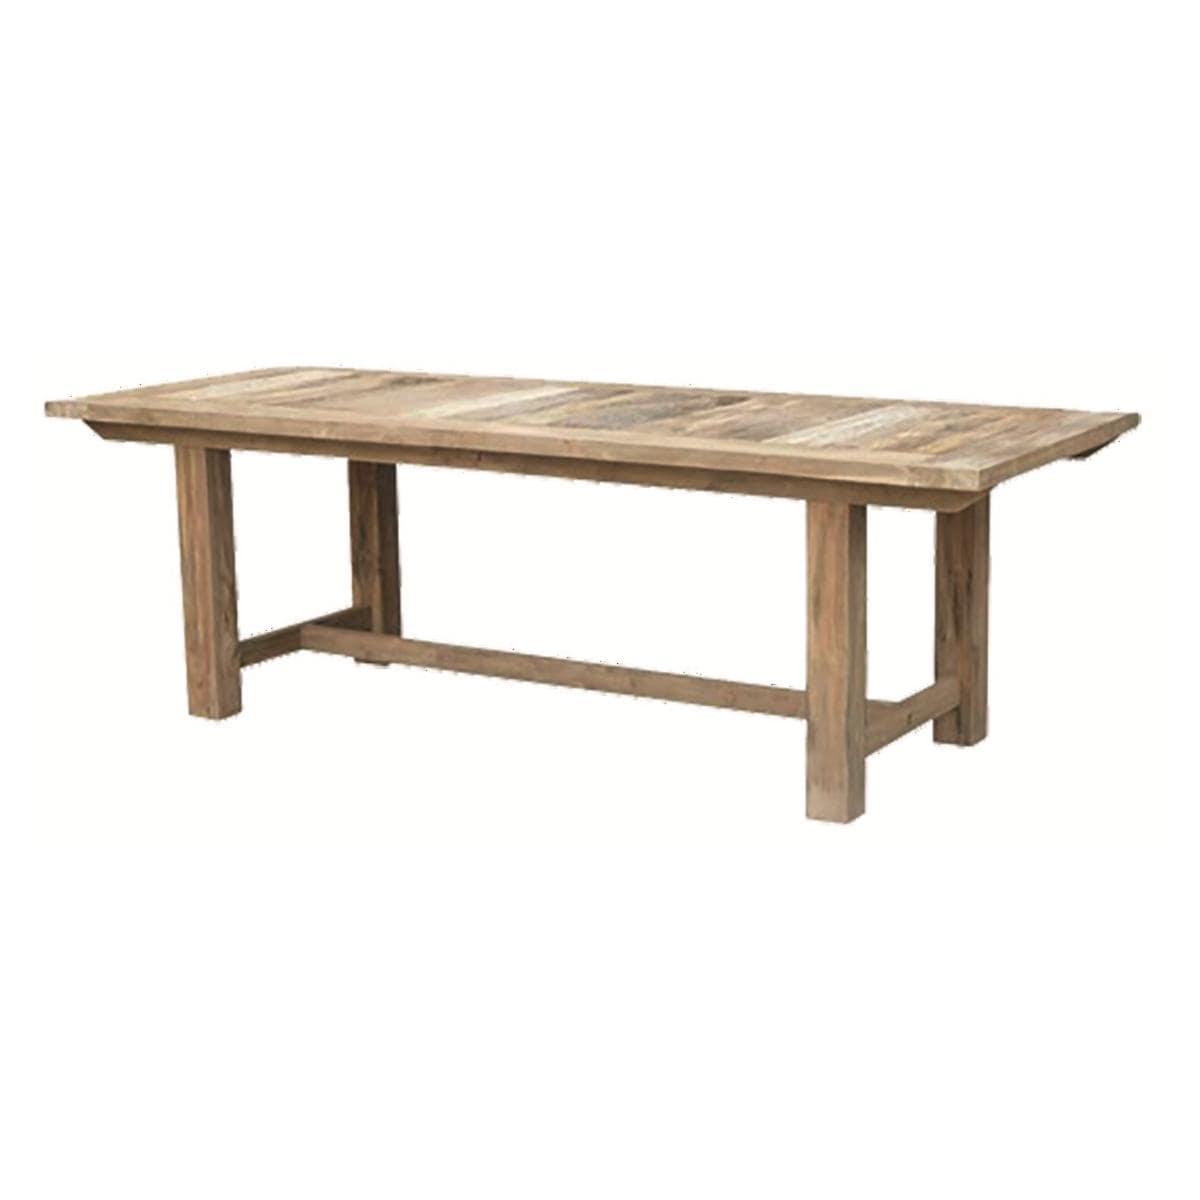 TABLE RALLONGE FERME TECK MANUFACTORI